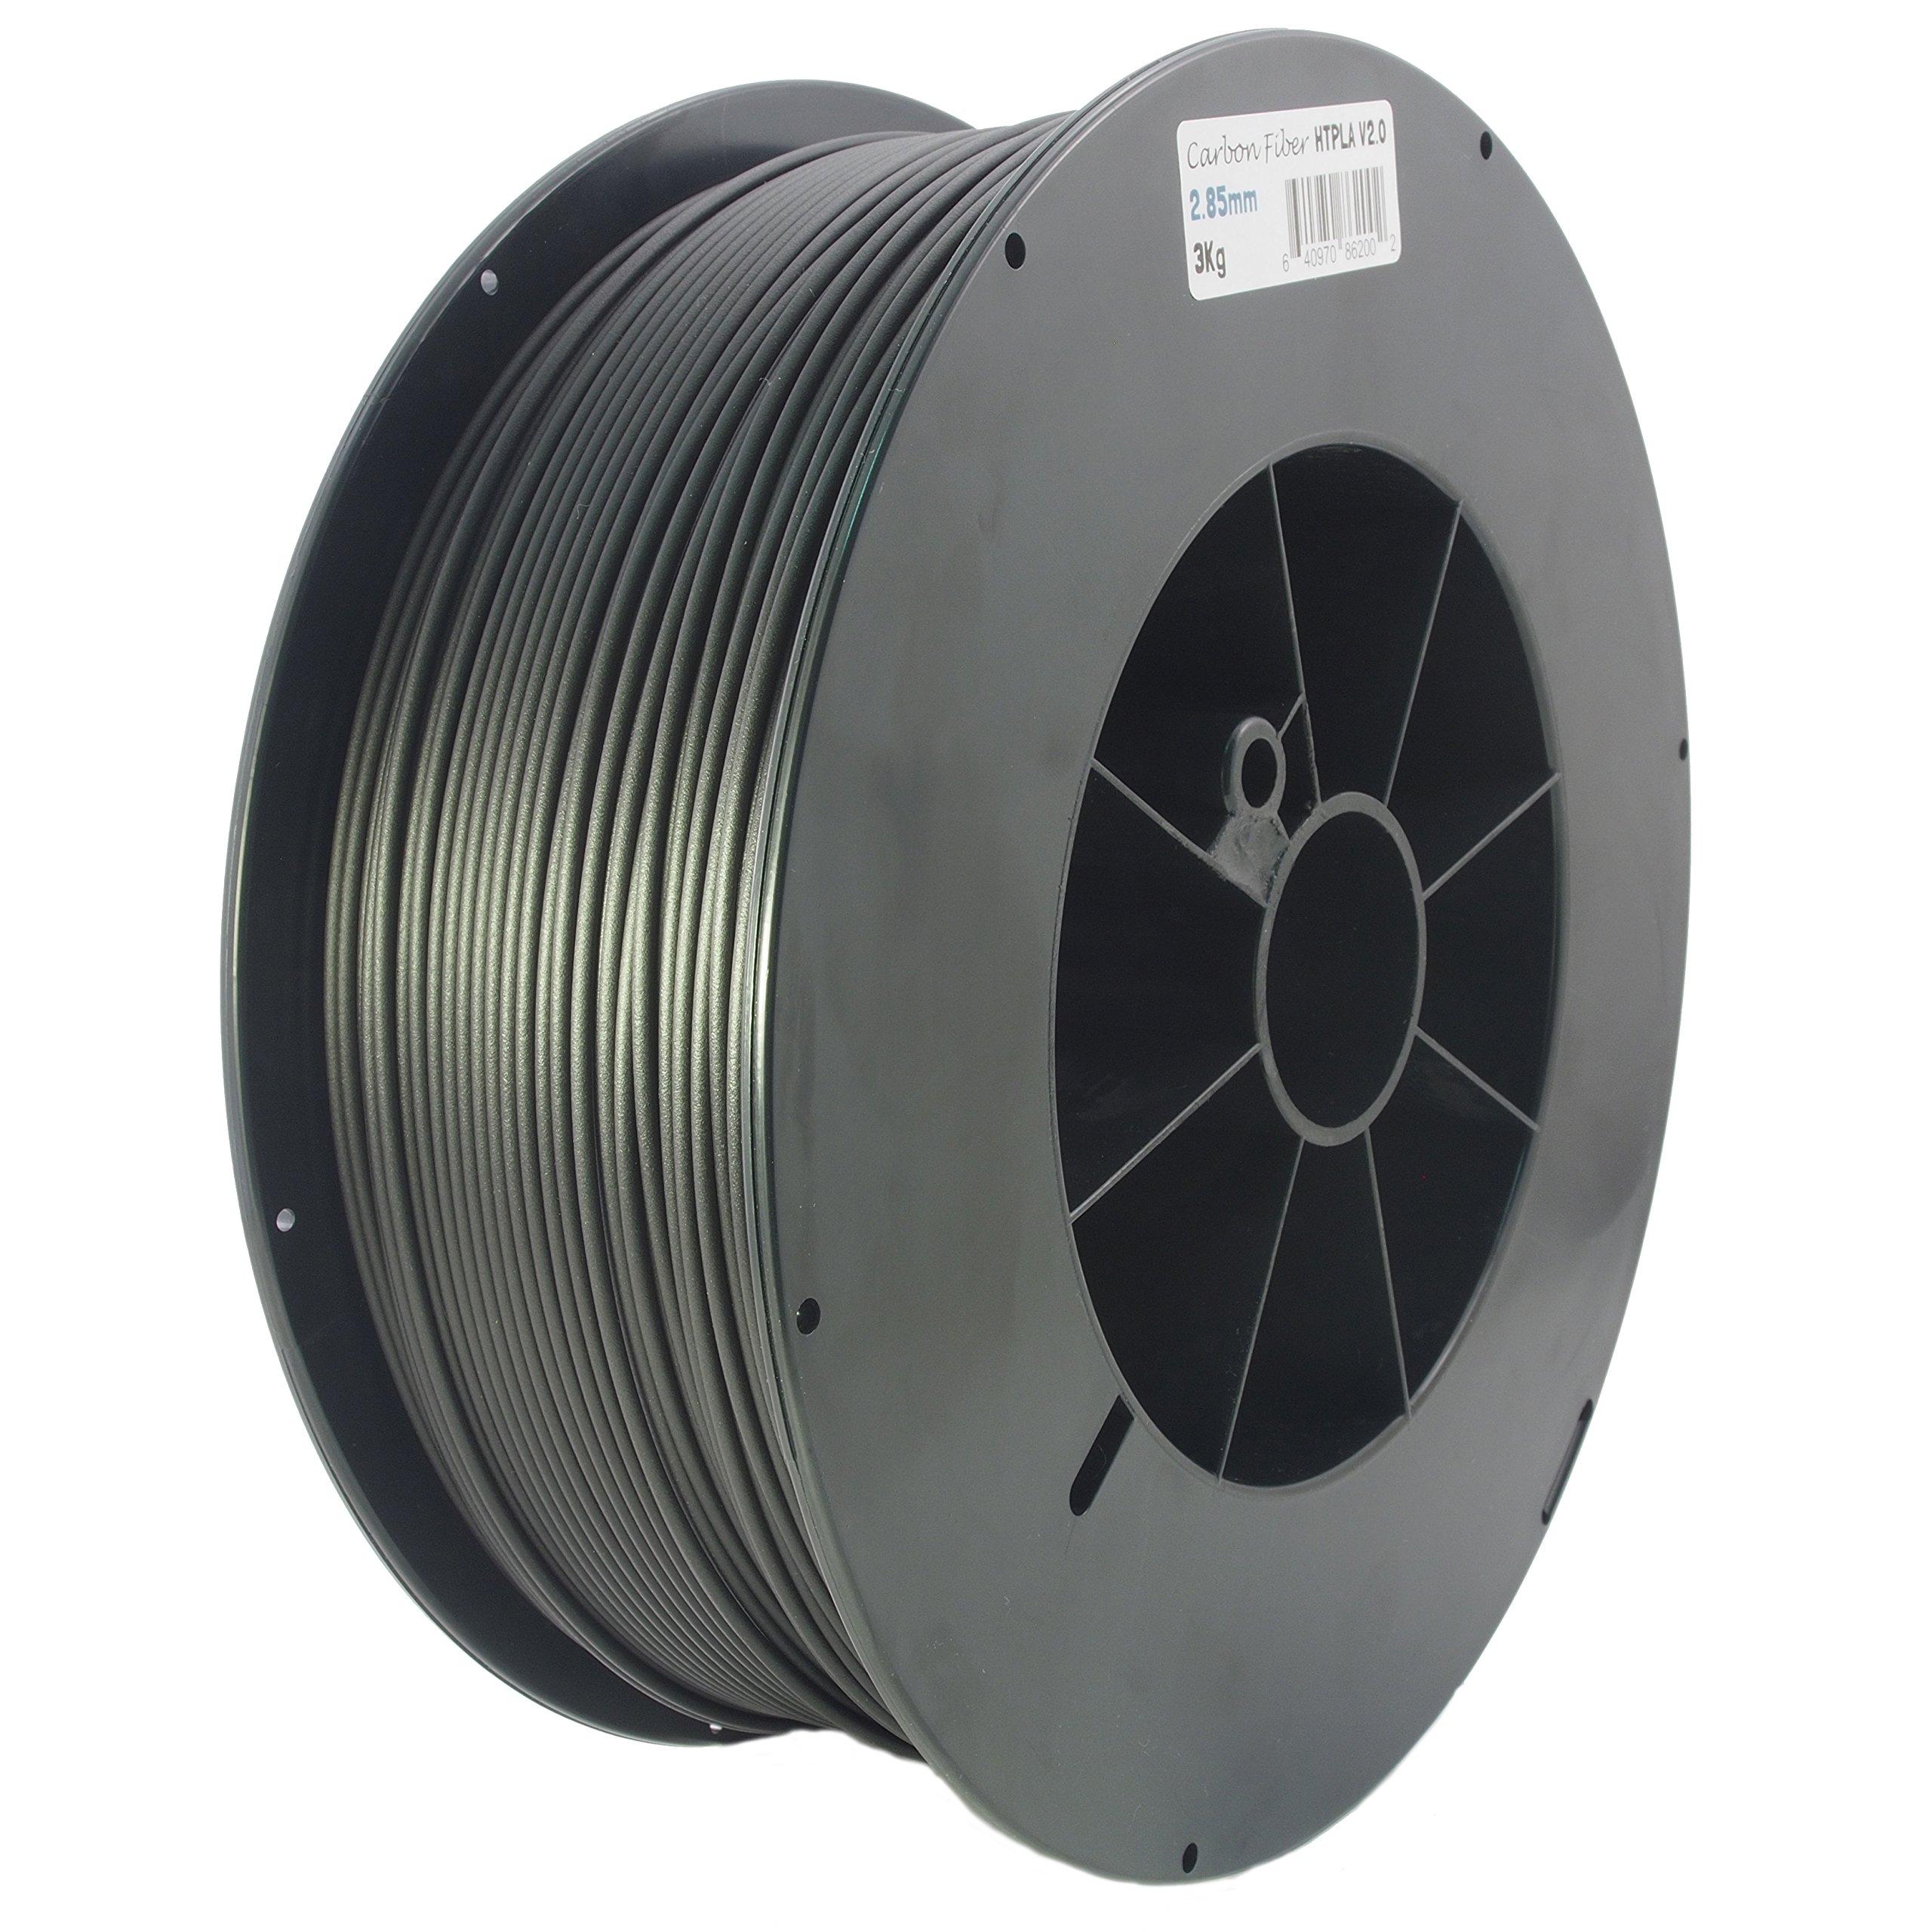 Filamento PLA 2.85mm 3kg COLOR FOTO-1 IMP 3D [1BDL4DTS]